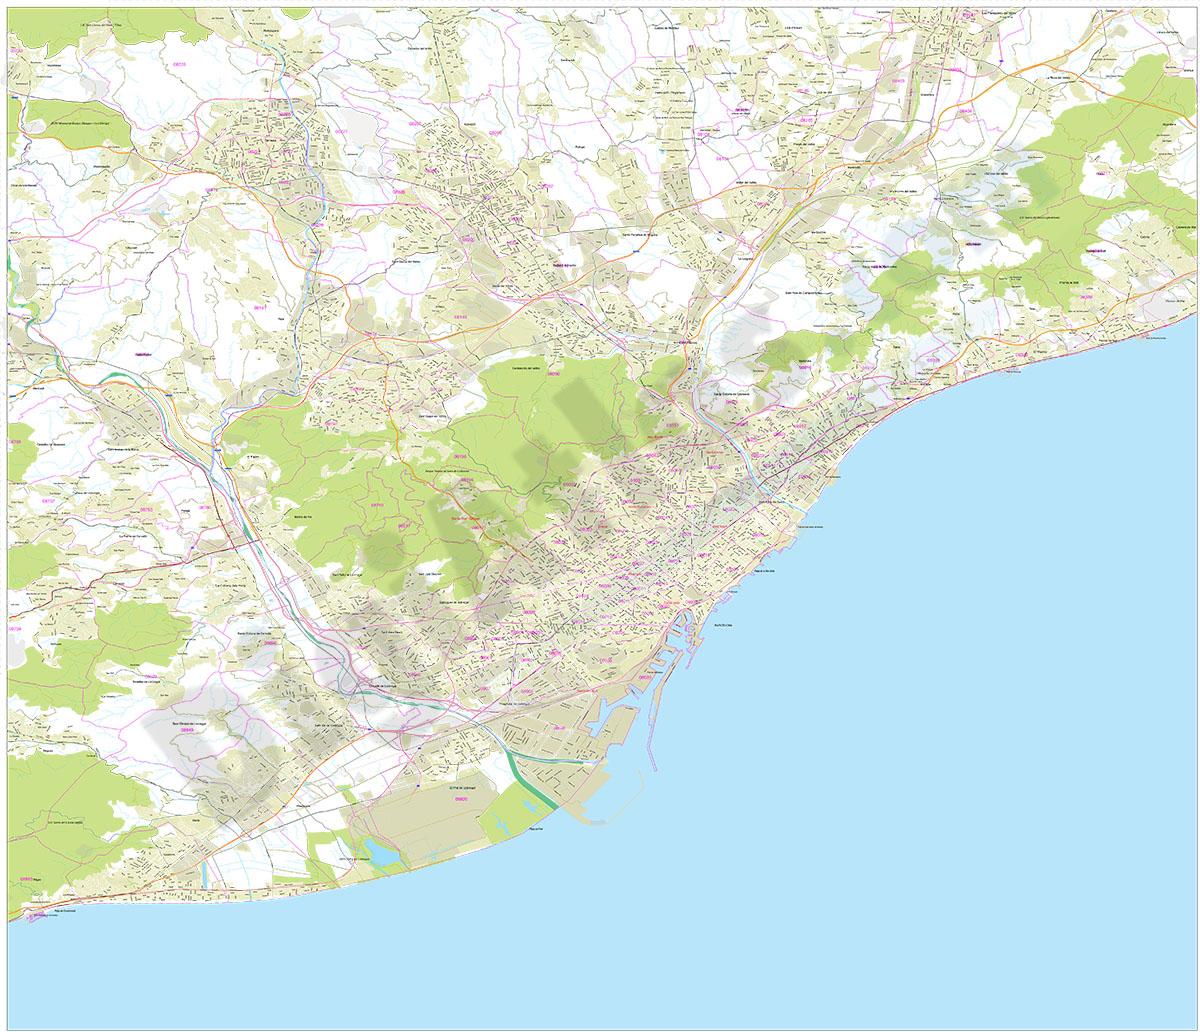 Map of Metropolitan Area of Barcelona